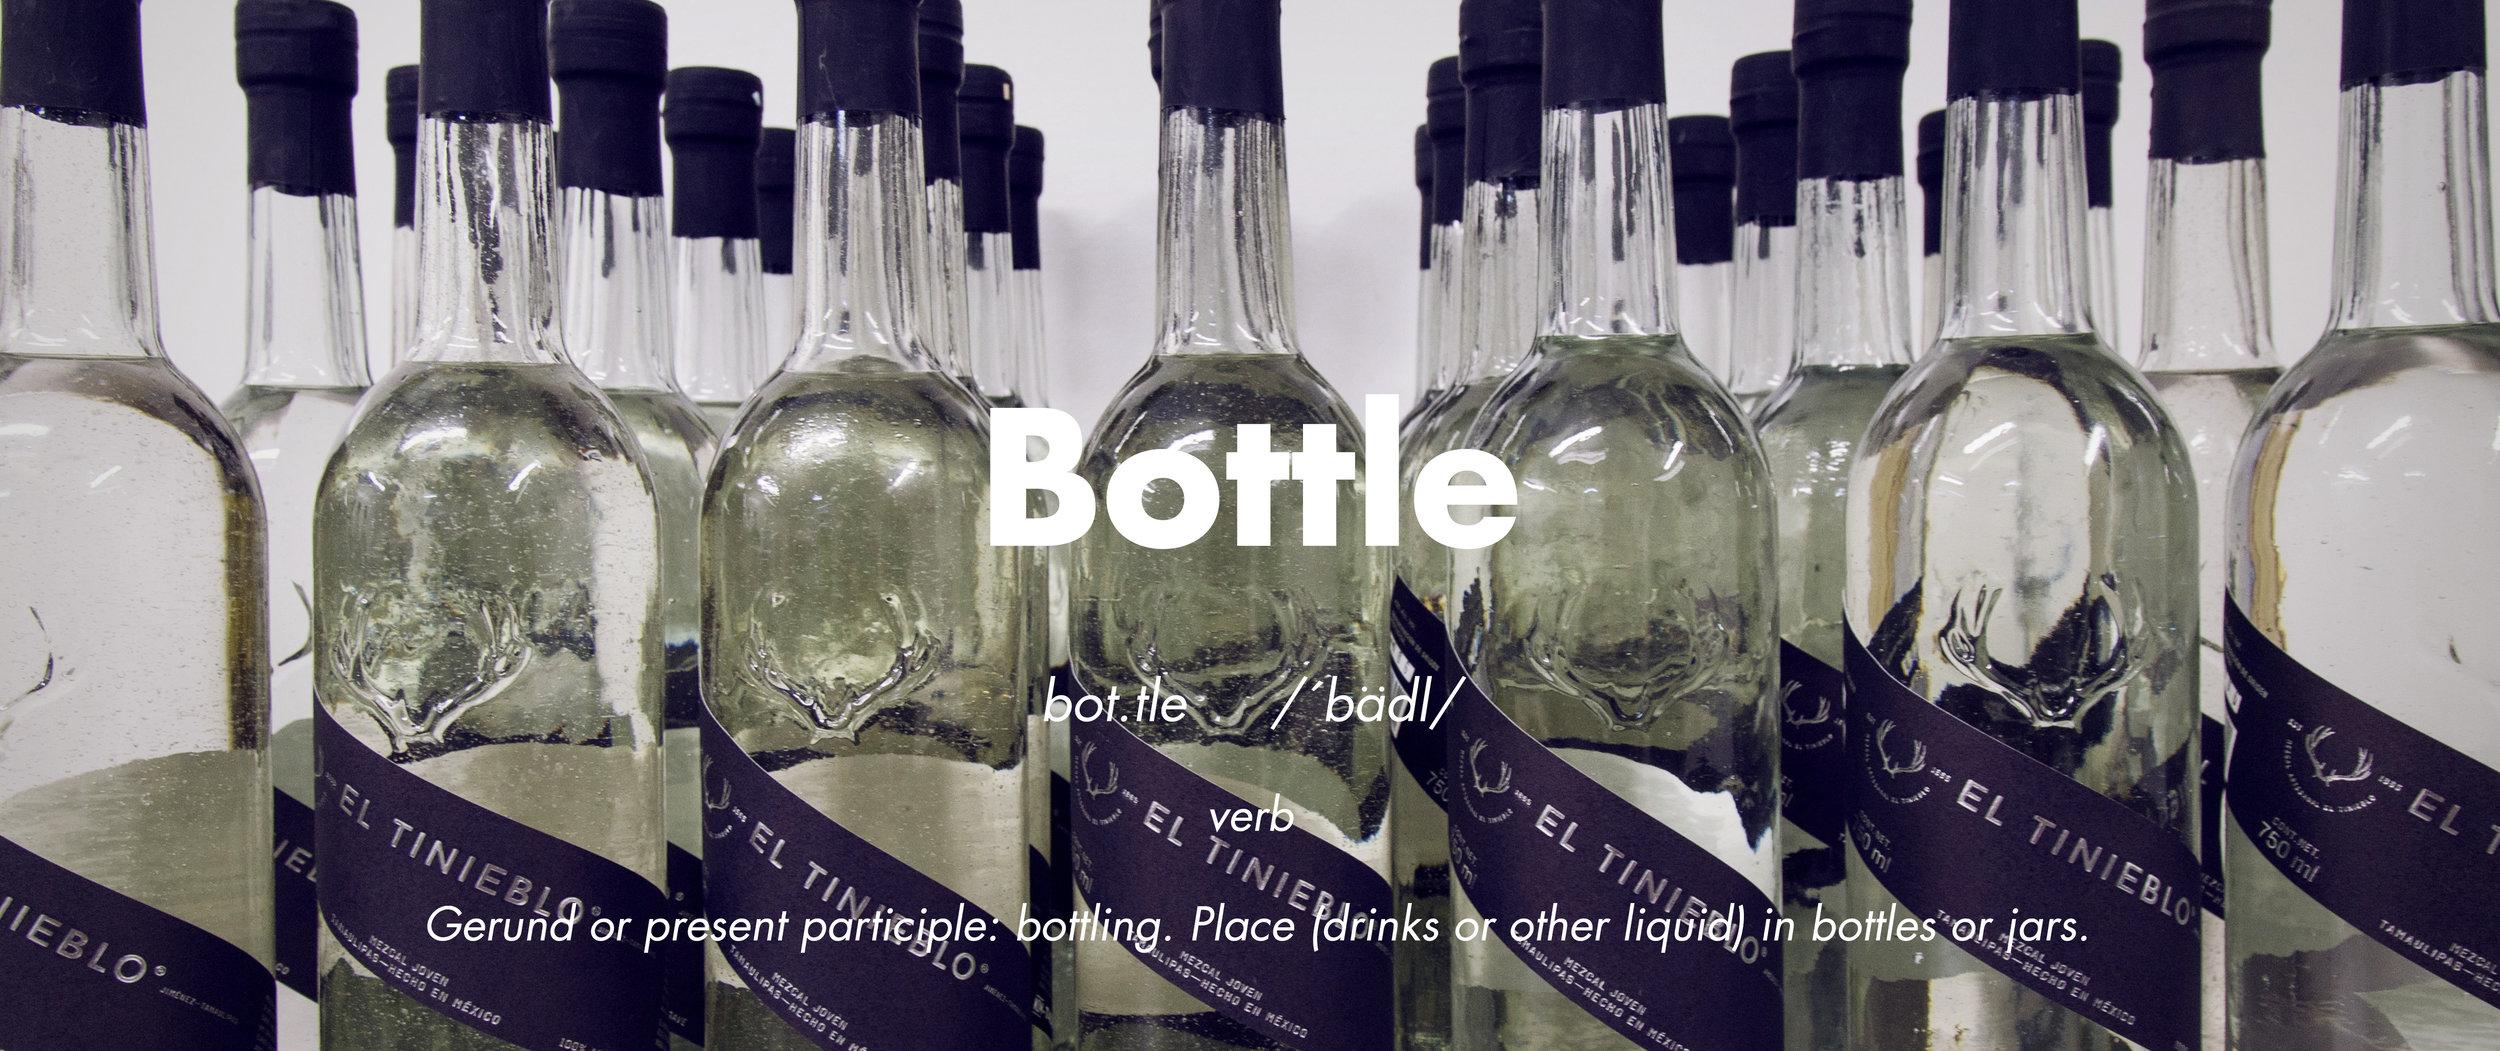 Artisanal bottling El Tinieblo